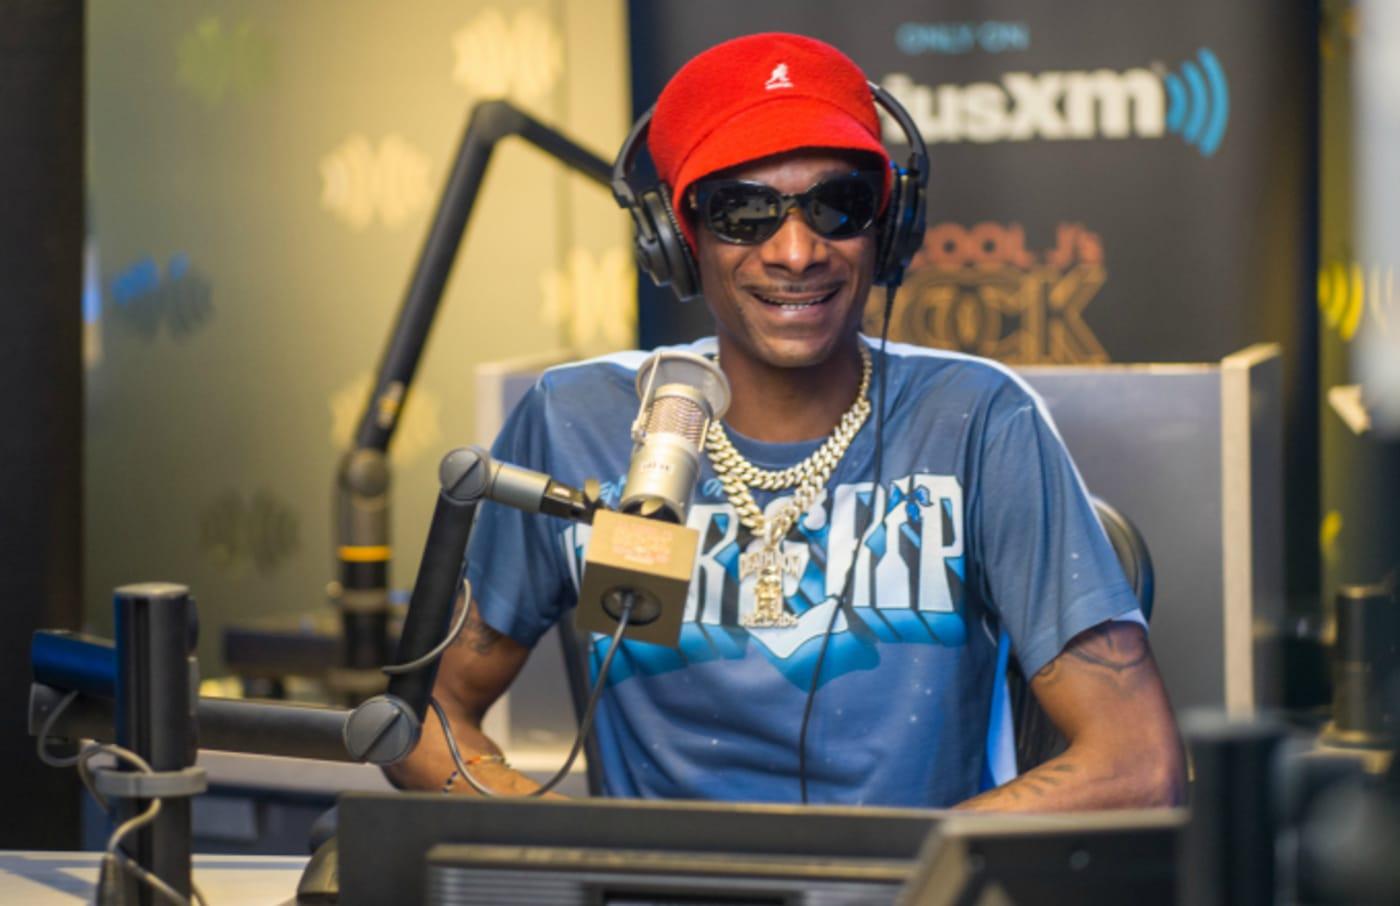 Snoop Dogg visits SiriusXM Studios